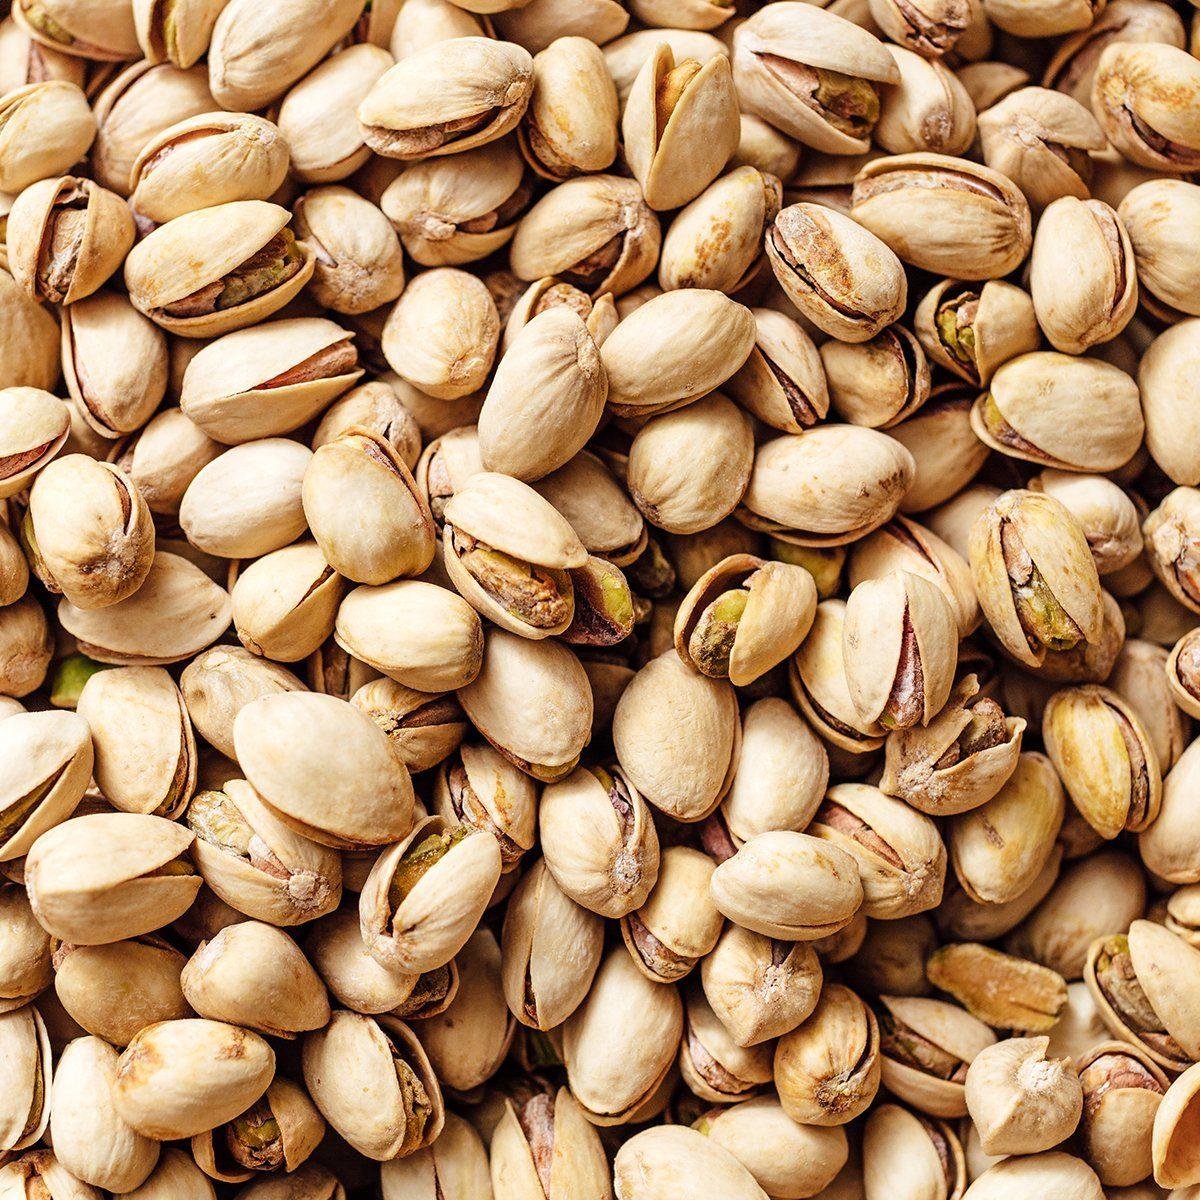 Pistachio texture. Nuts. Close-up of pistachio. Salted pistachio - beer snack.